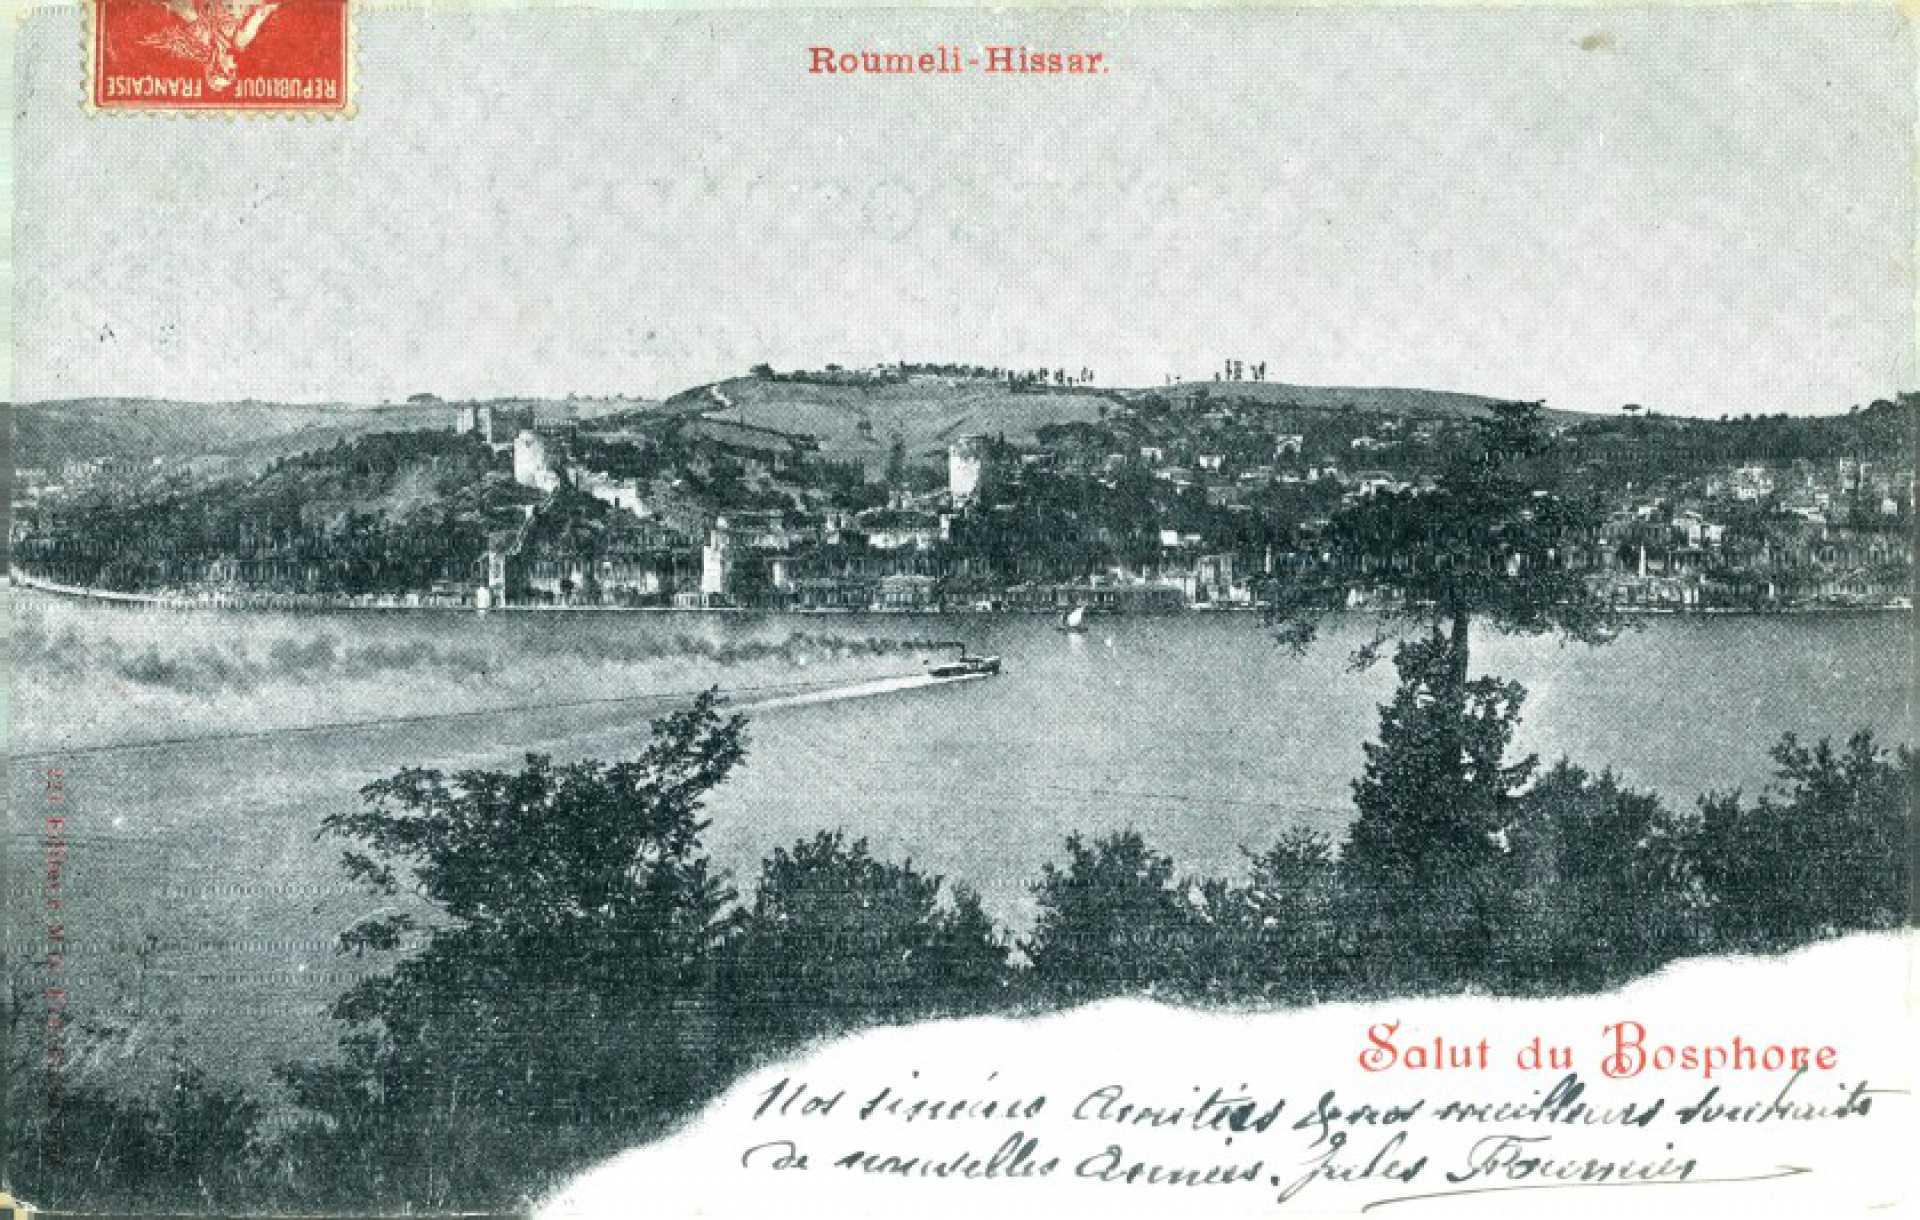 Salut du Bospore. Roumeli – Hissar